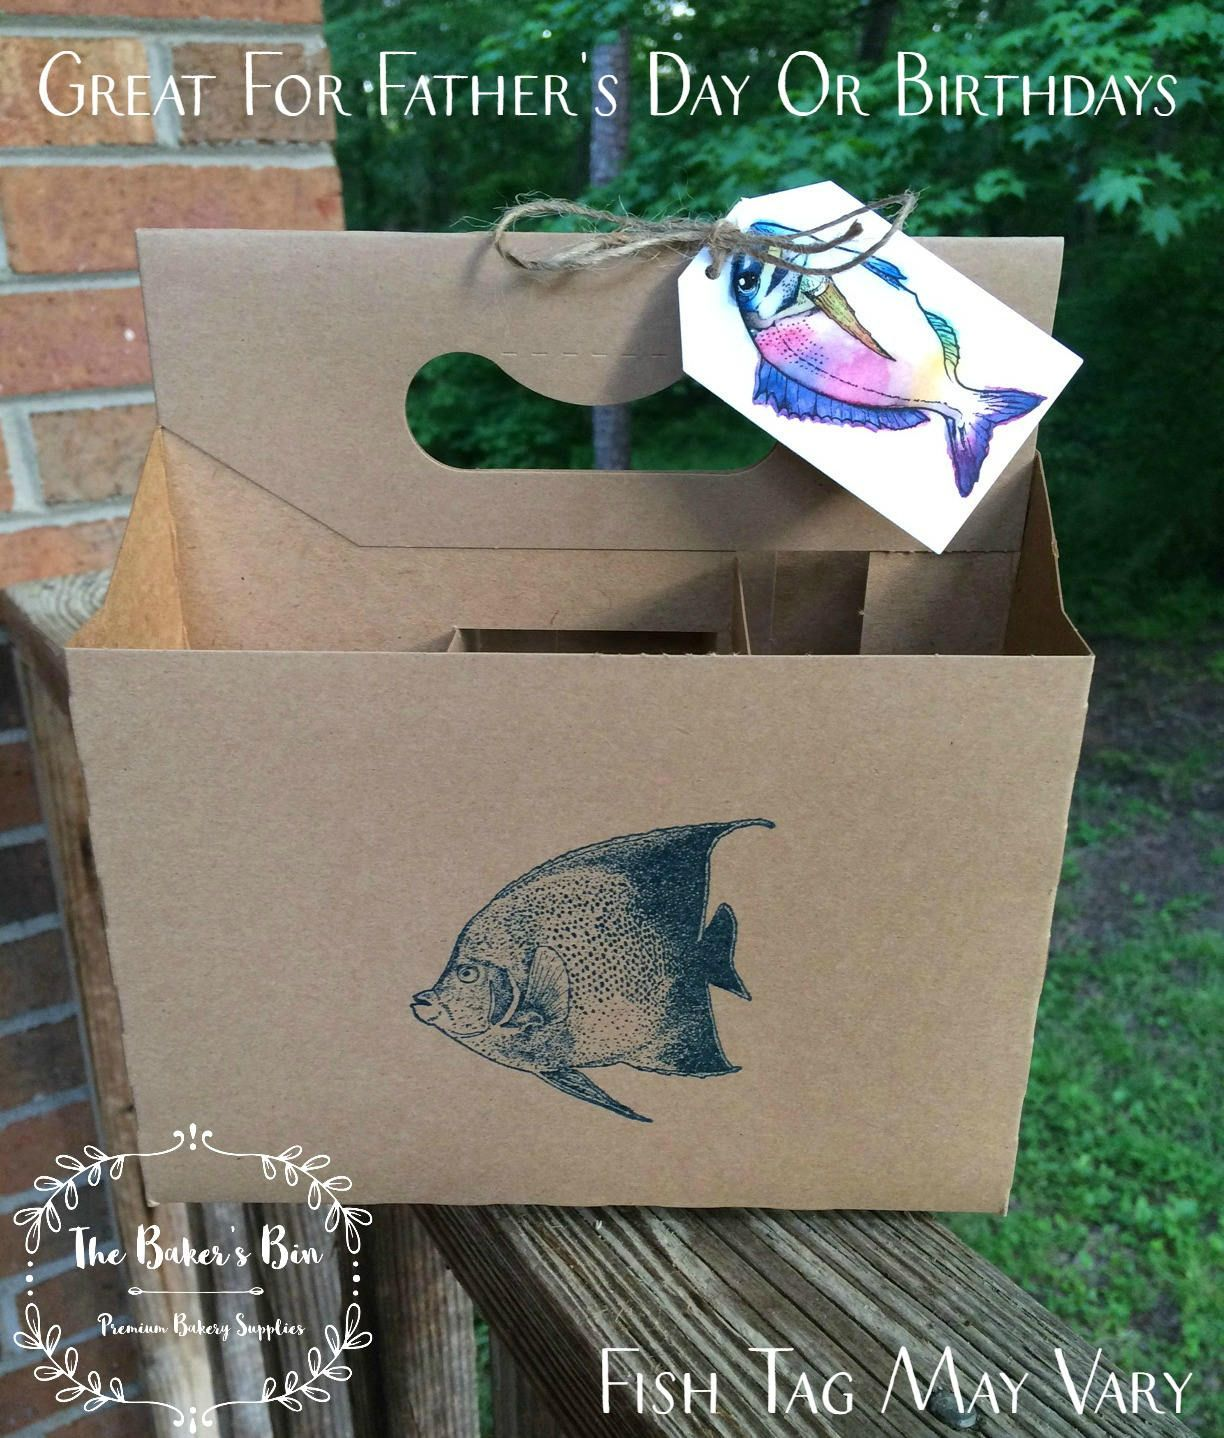 6 Pack Kraft Beverage Holder 12 Oz Bottle Holders Kraft Cardboard 6 Pack Beer Carrier 7 5 8 X 5 1 4 X 8 Craft Bee Beer Carrier Beer Fish Craft Beer